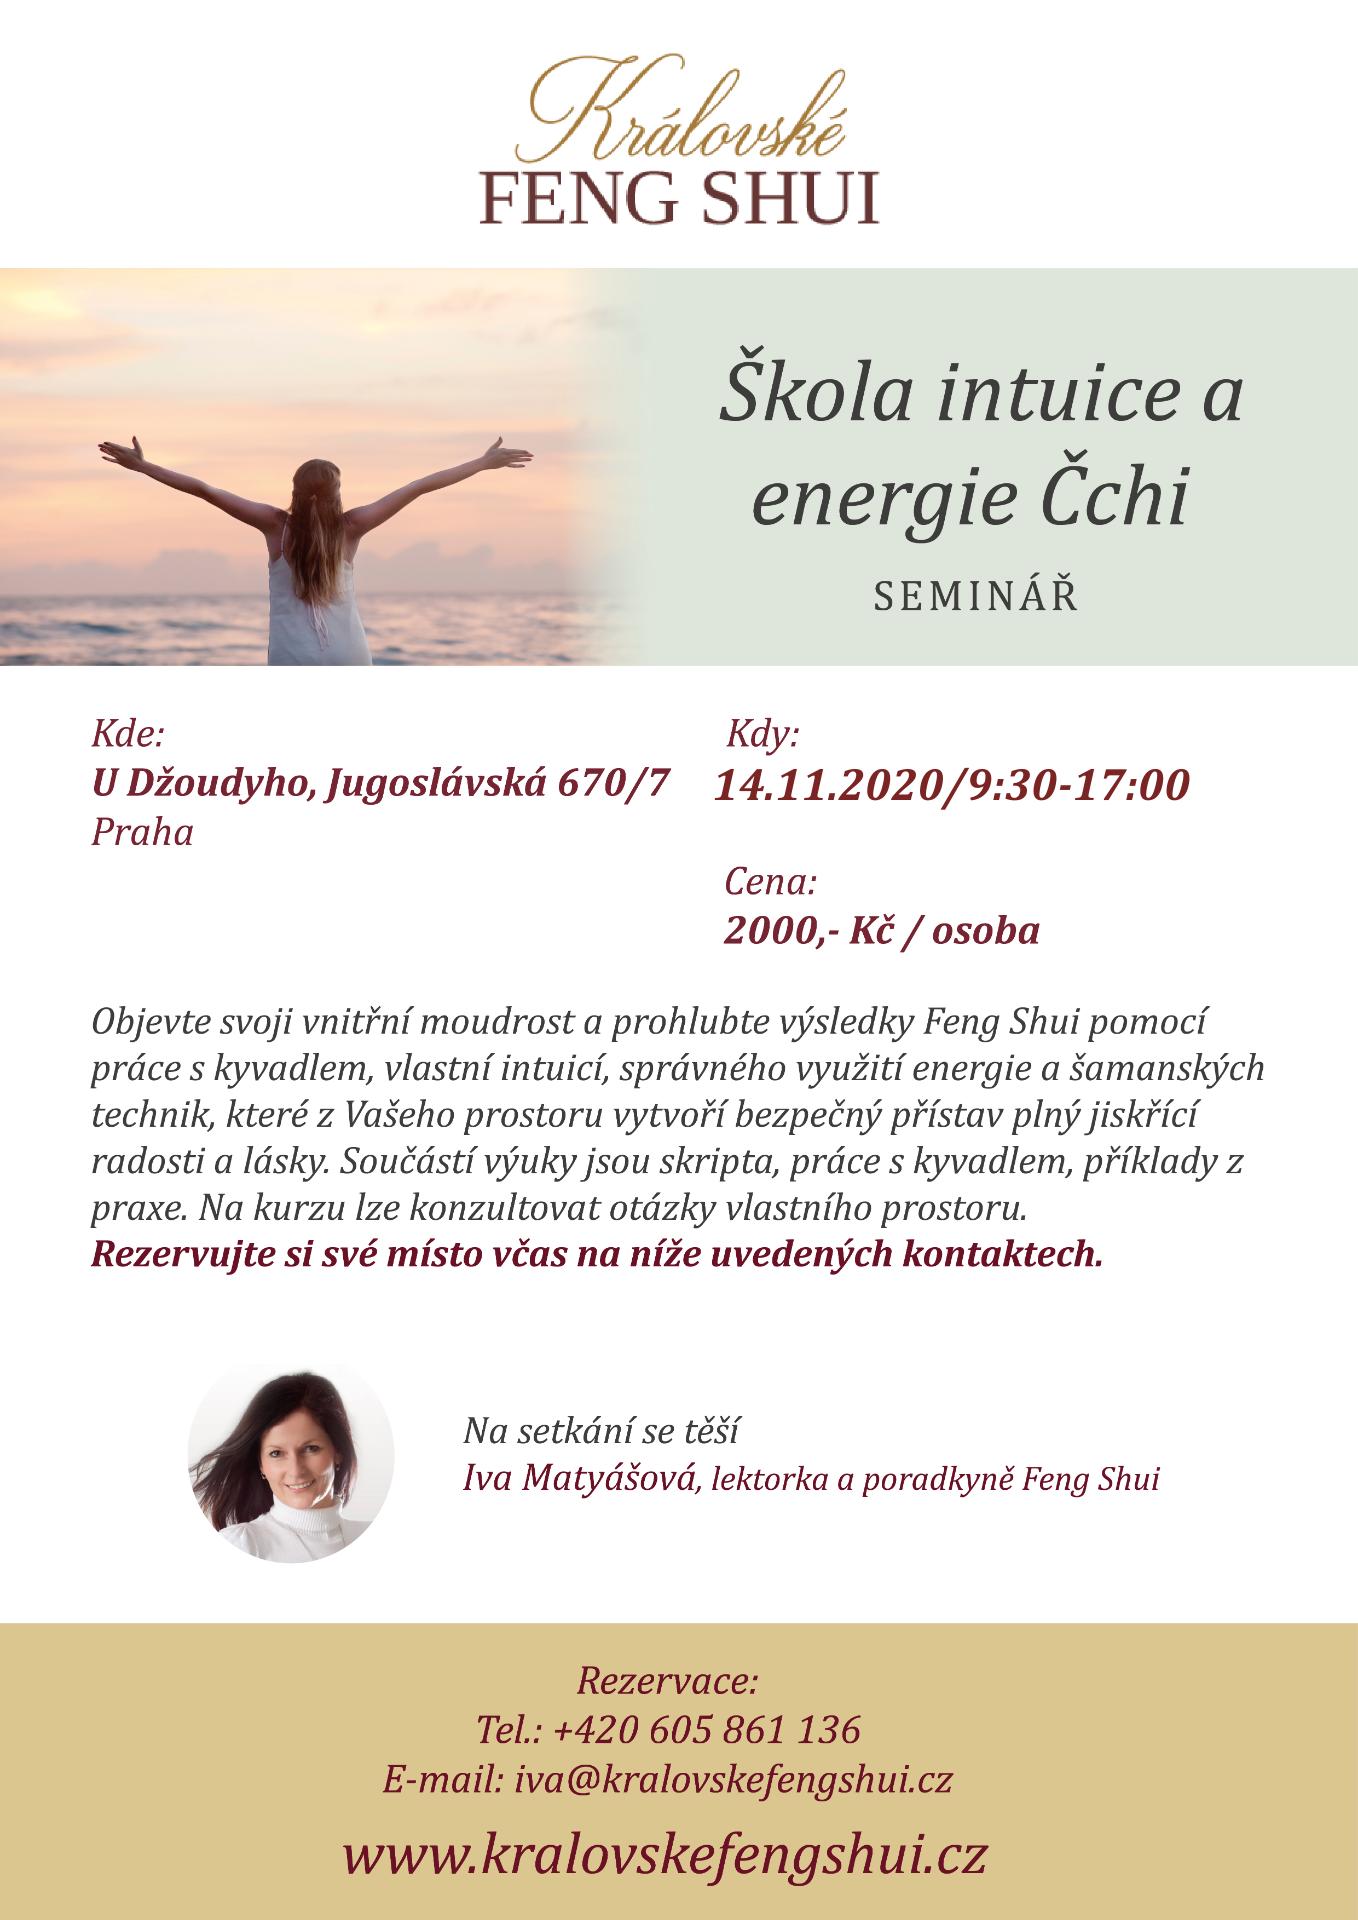 FENG SHUI – ŠKOLA INTUICE A ENERGIE ČCHI (14.11.2020 - 9:30-17:00hod)